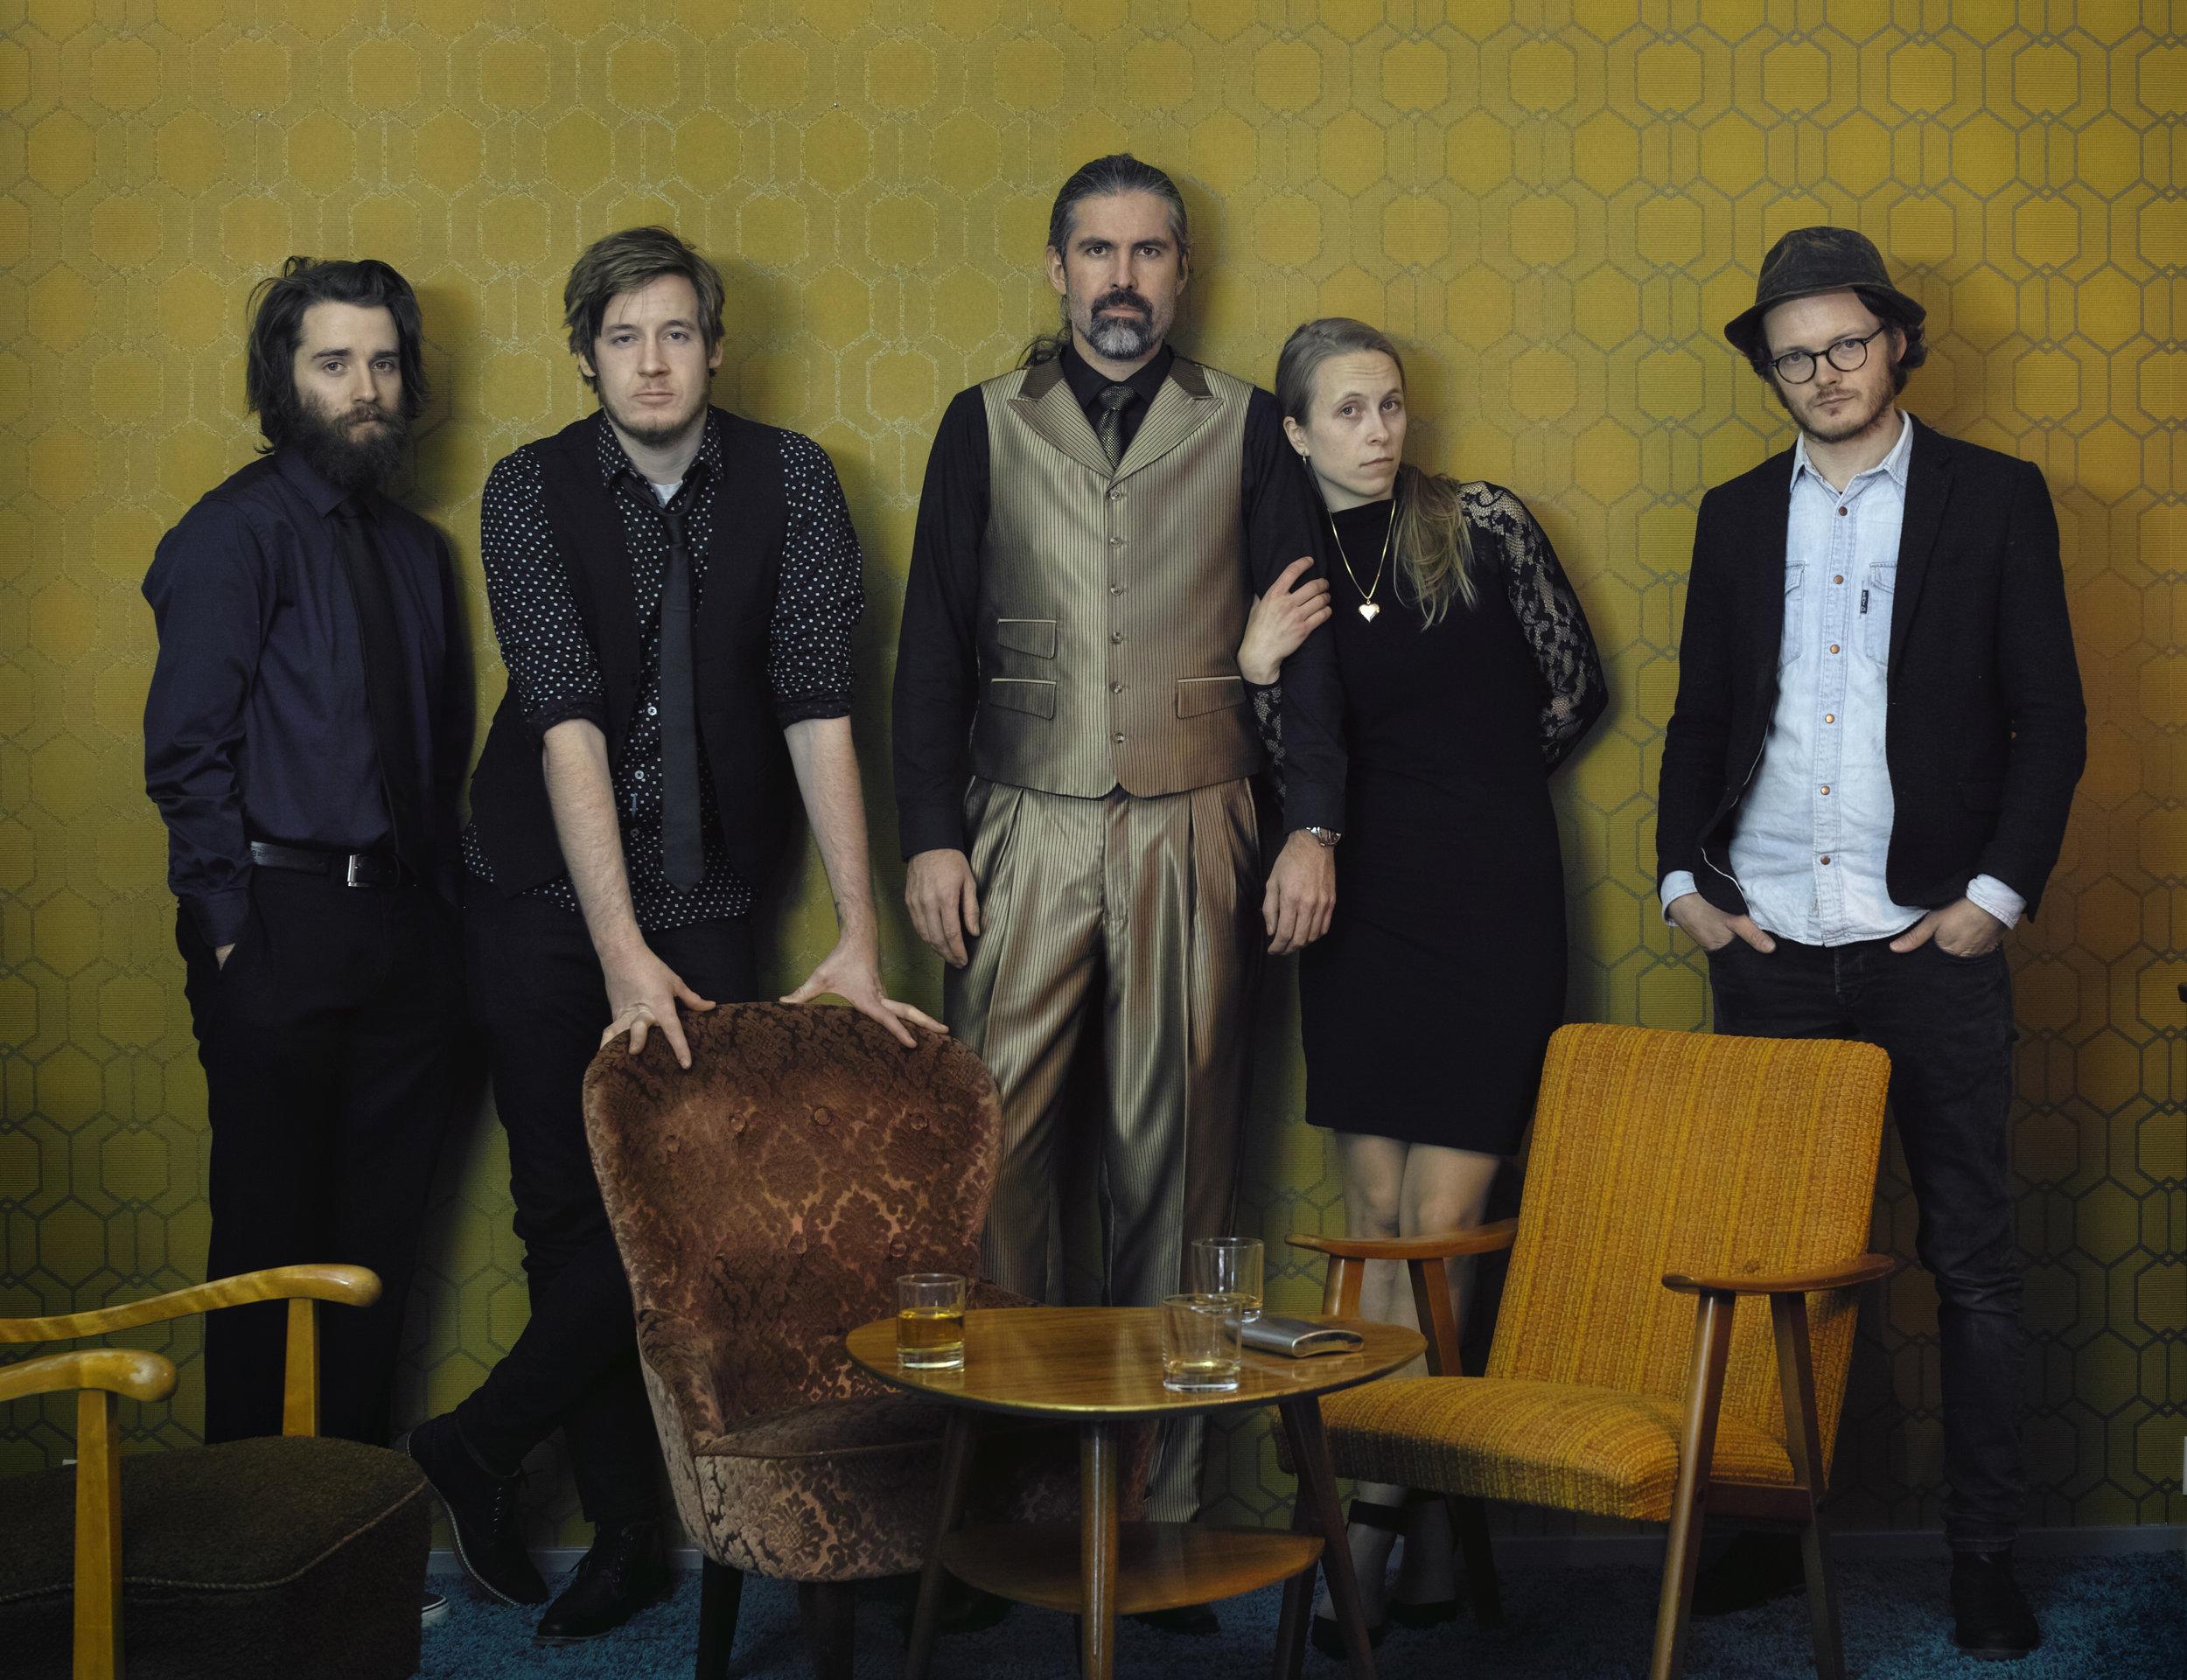 Photo: Roald Sundal From Left: Lars Håvard Birkenes, Knut Heggdal, Vidar Vedå, Cecilie Anna, Endre Olsen